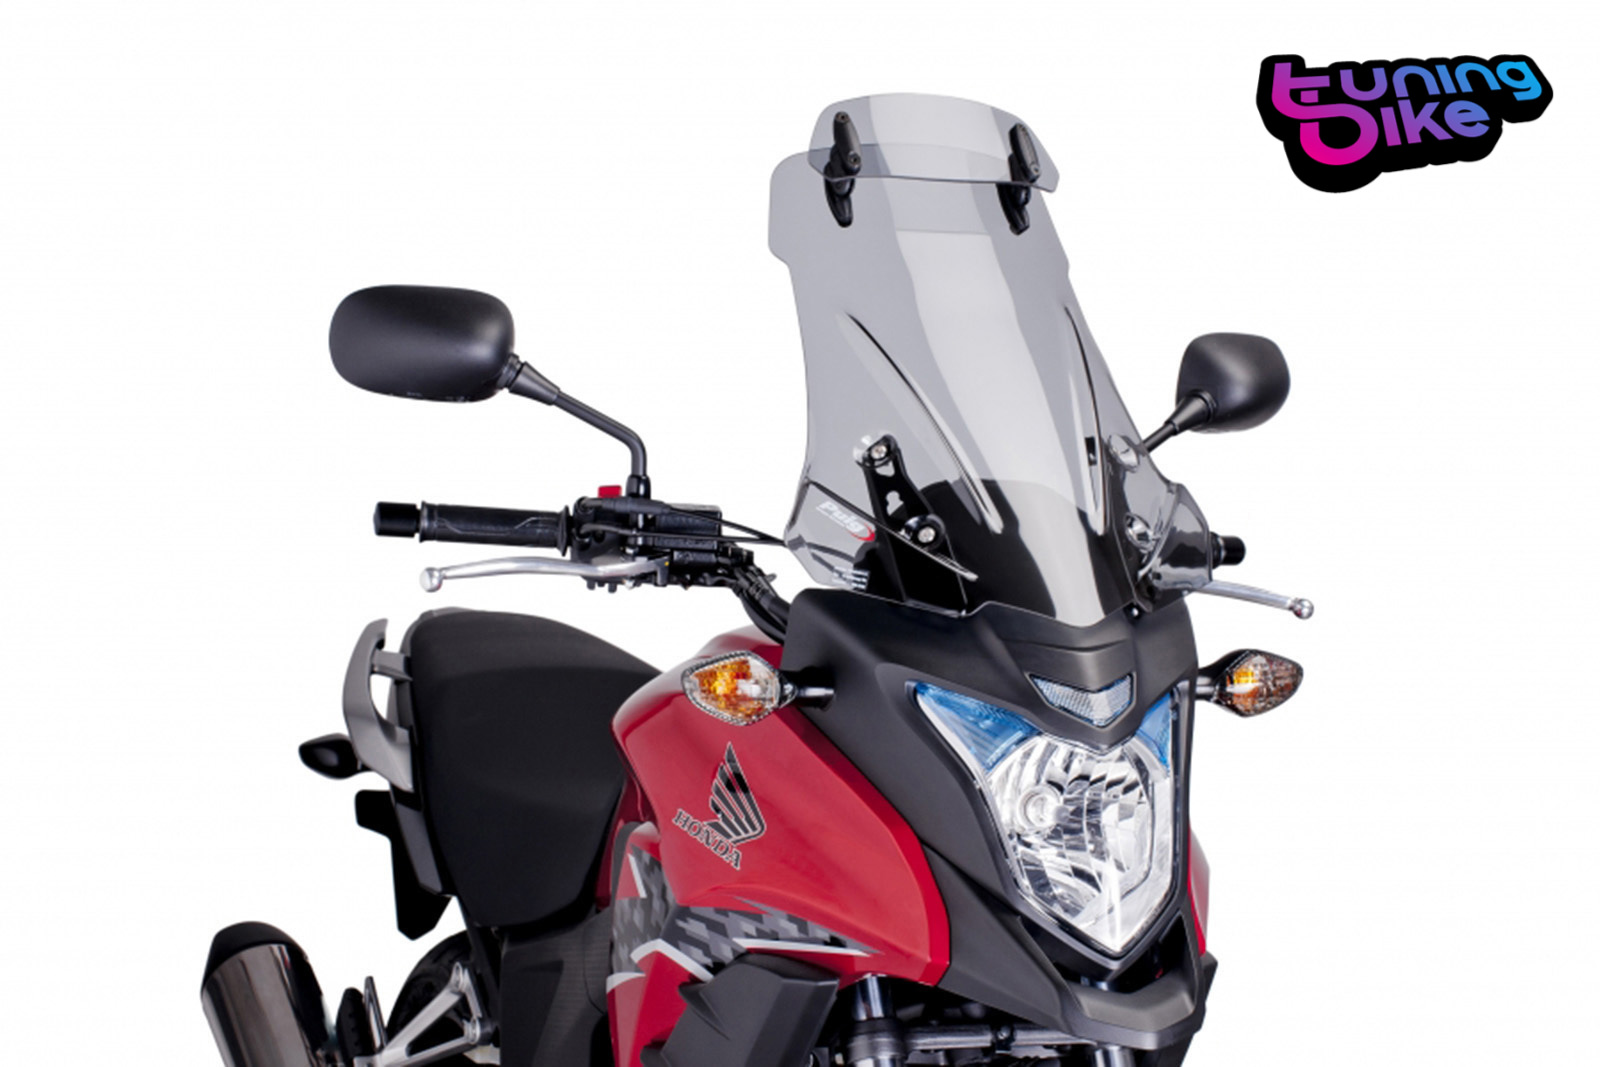 HONDA CB 500 X 2013 /> PUIG SCREEN DARK SMOKE TOURING WINDSCREEN